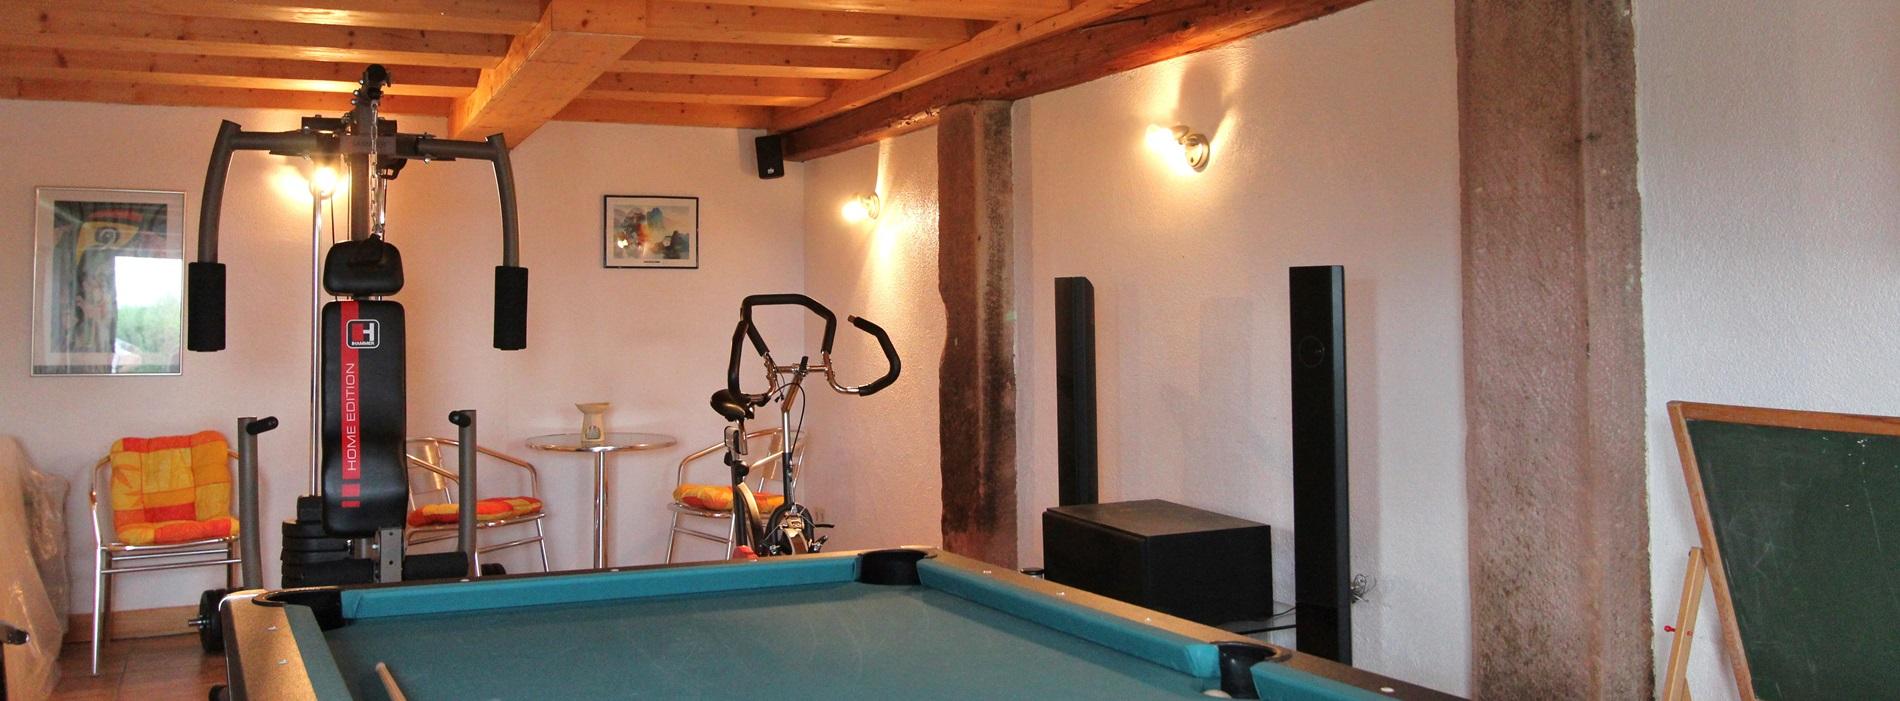 Fitnessraum Ferienhaus Hubhof